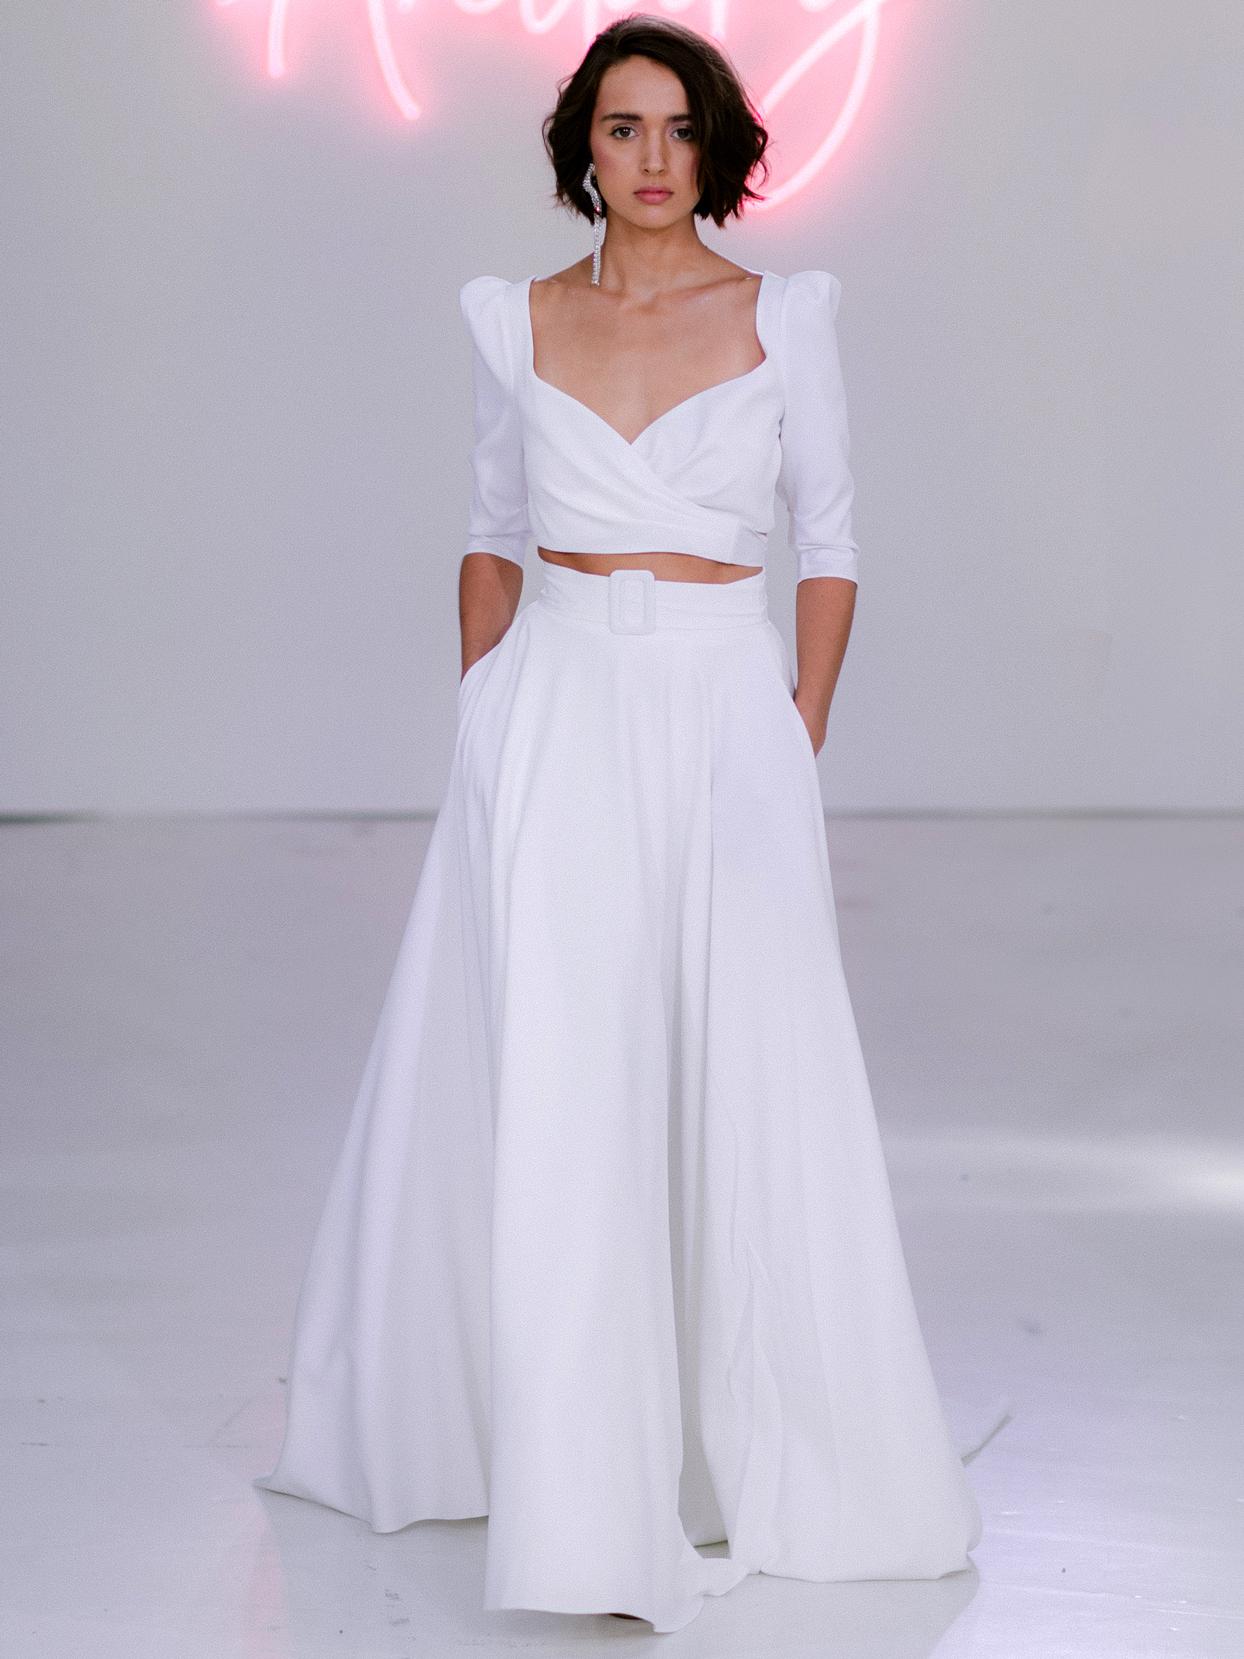 Rime Arodaky X The Mews Bridal two piece belt wedding dress fall 2020